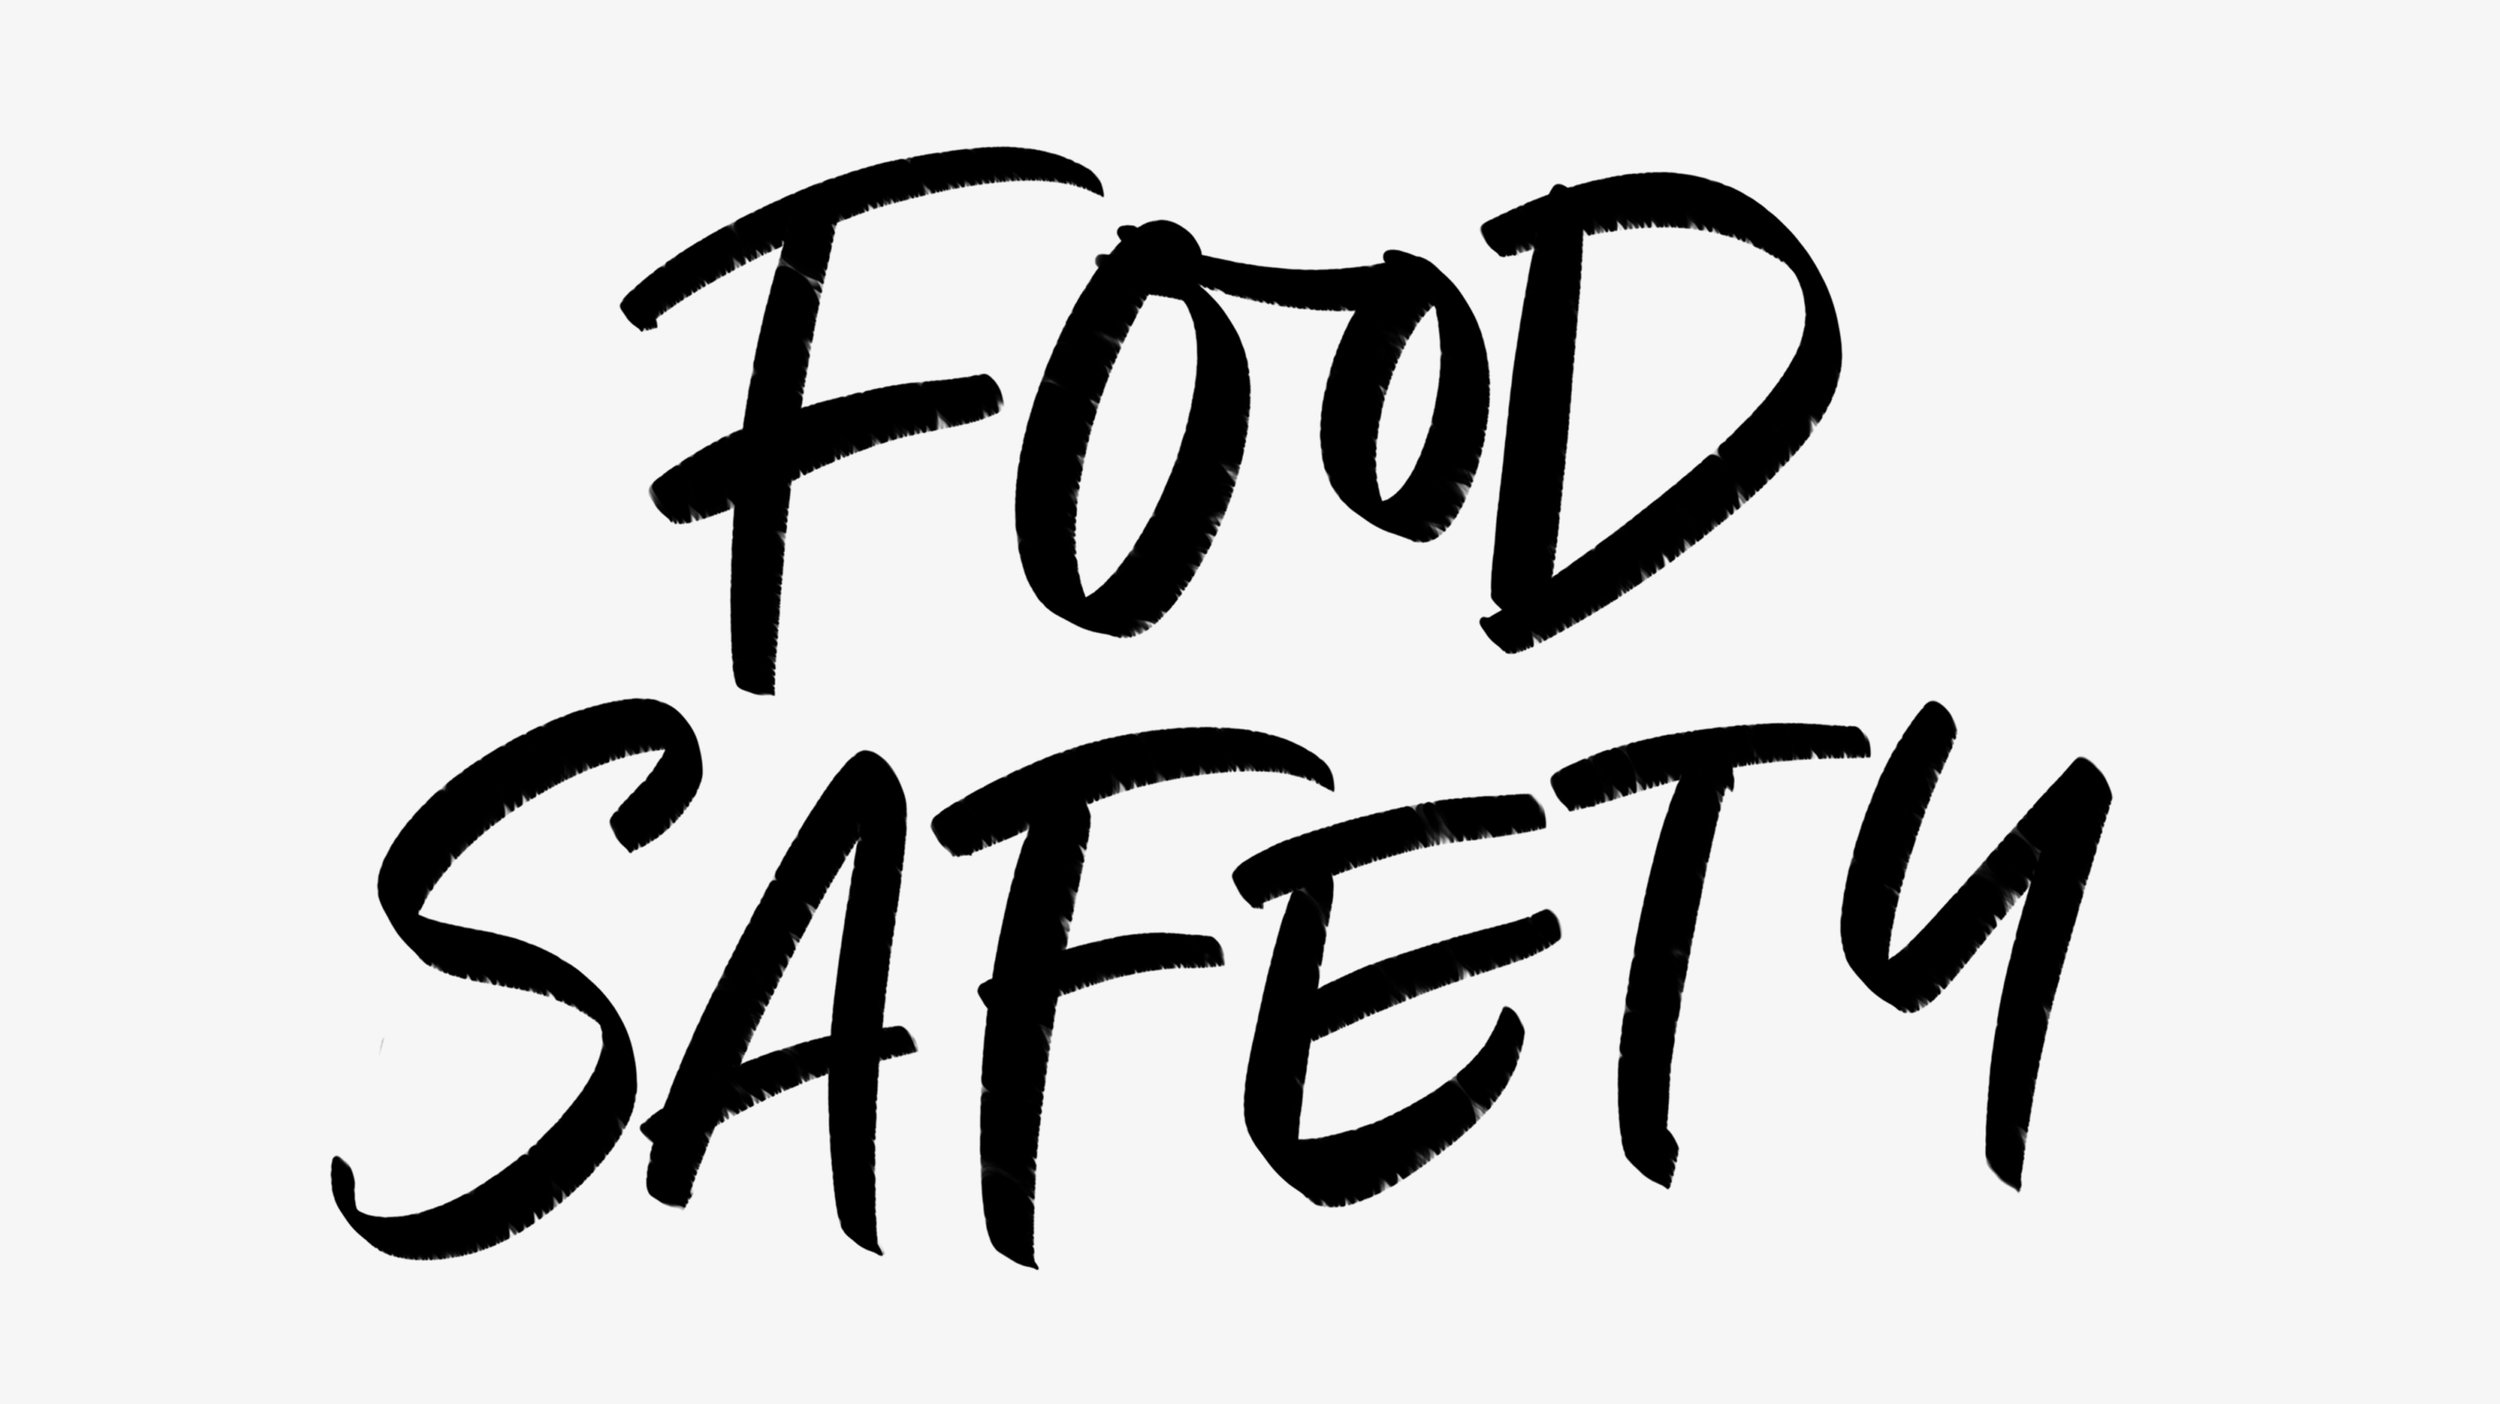 SC_Food Safety.jpg